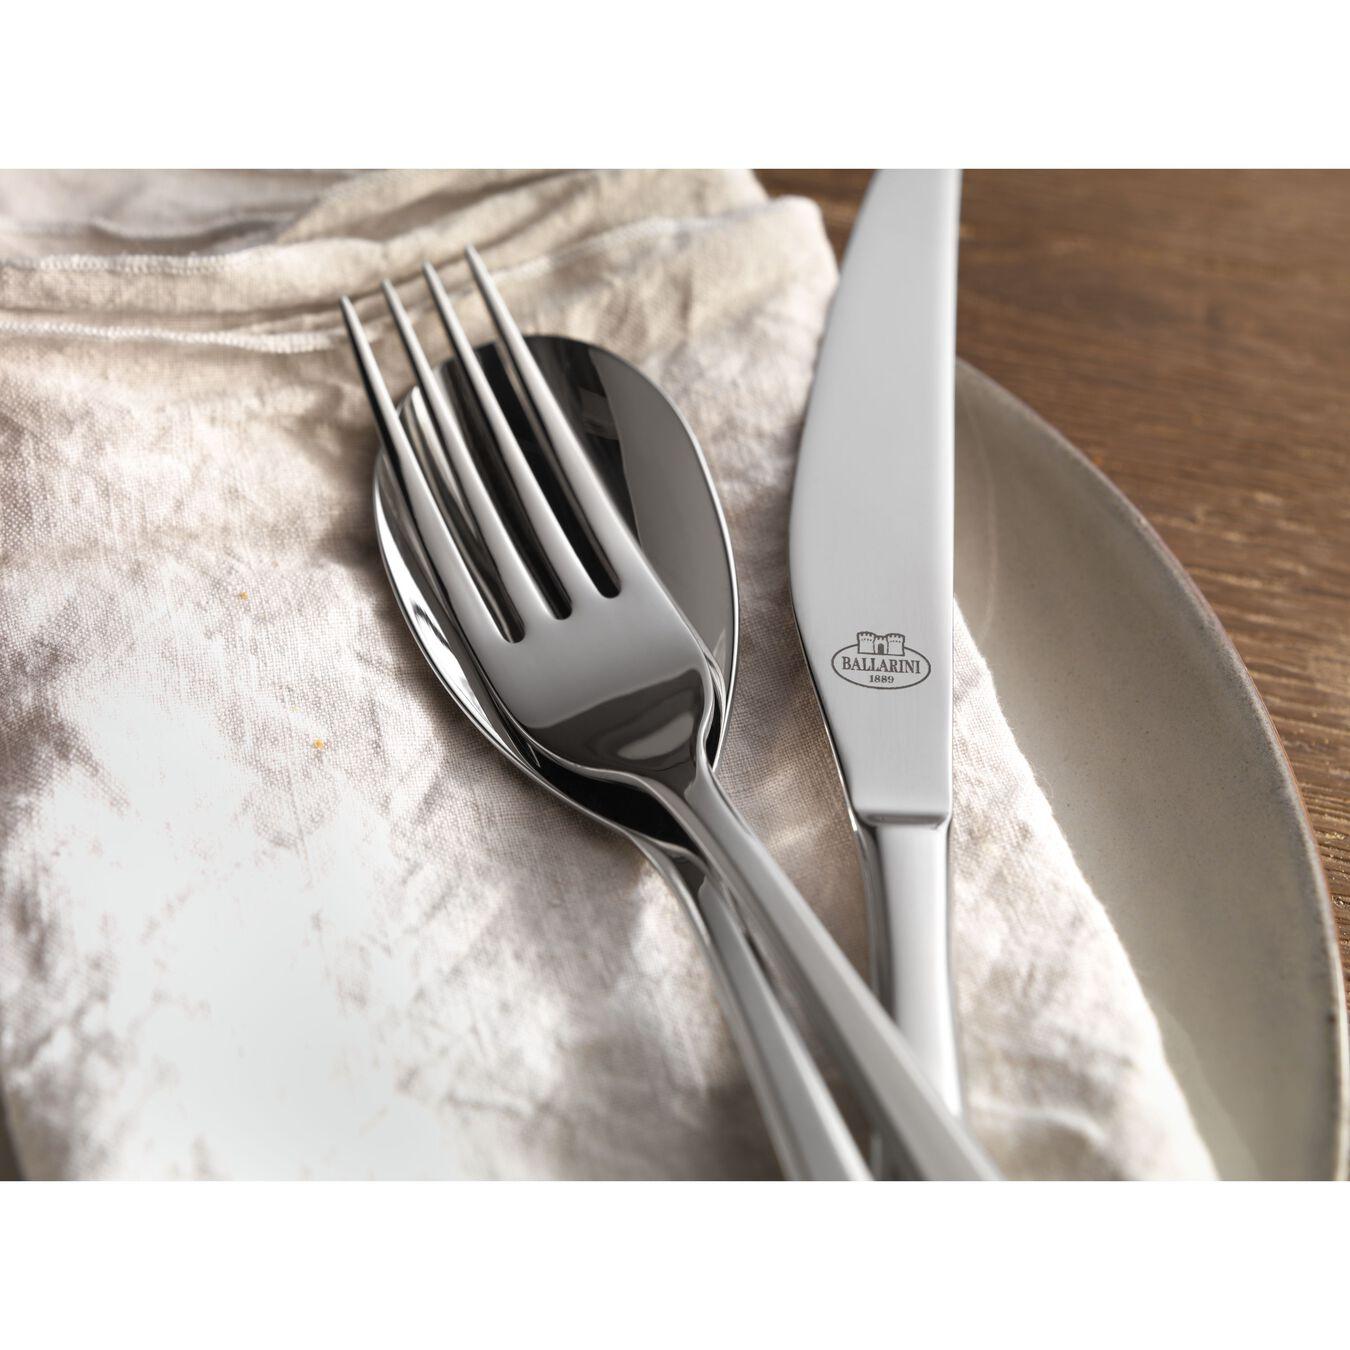 Set di posate da degustazione - 60-pz., 18/10 acciaio inossidabile,,large 2